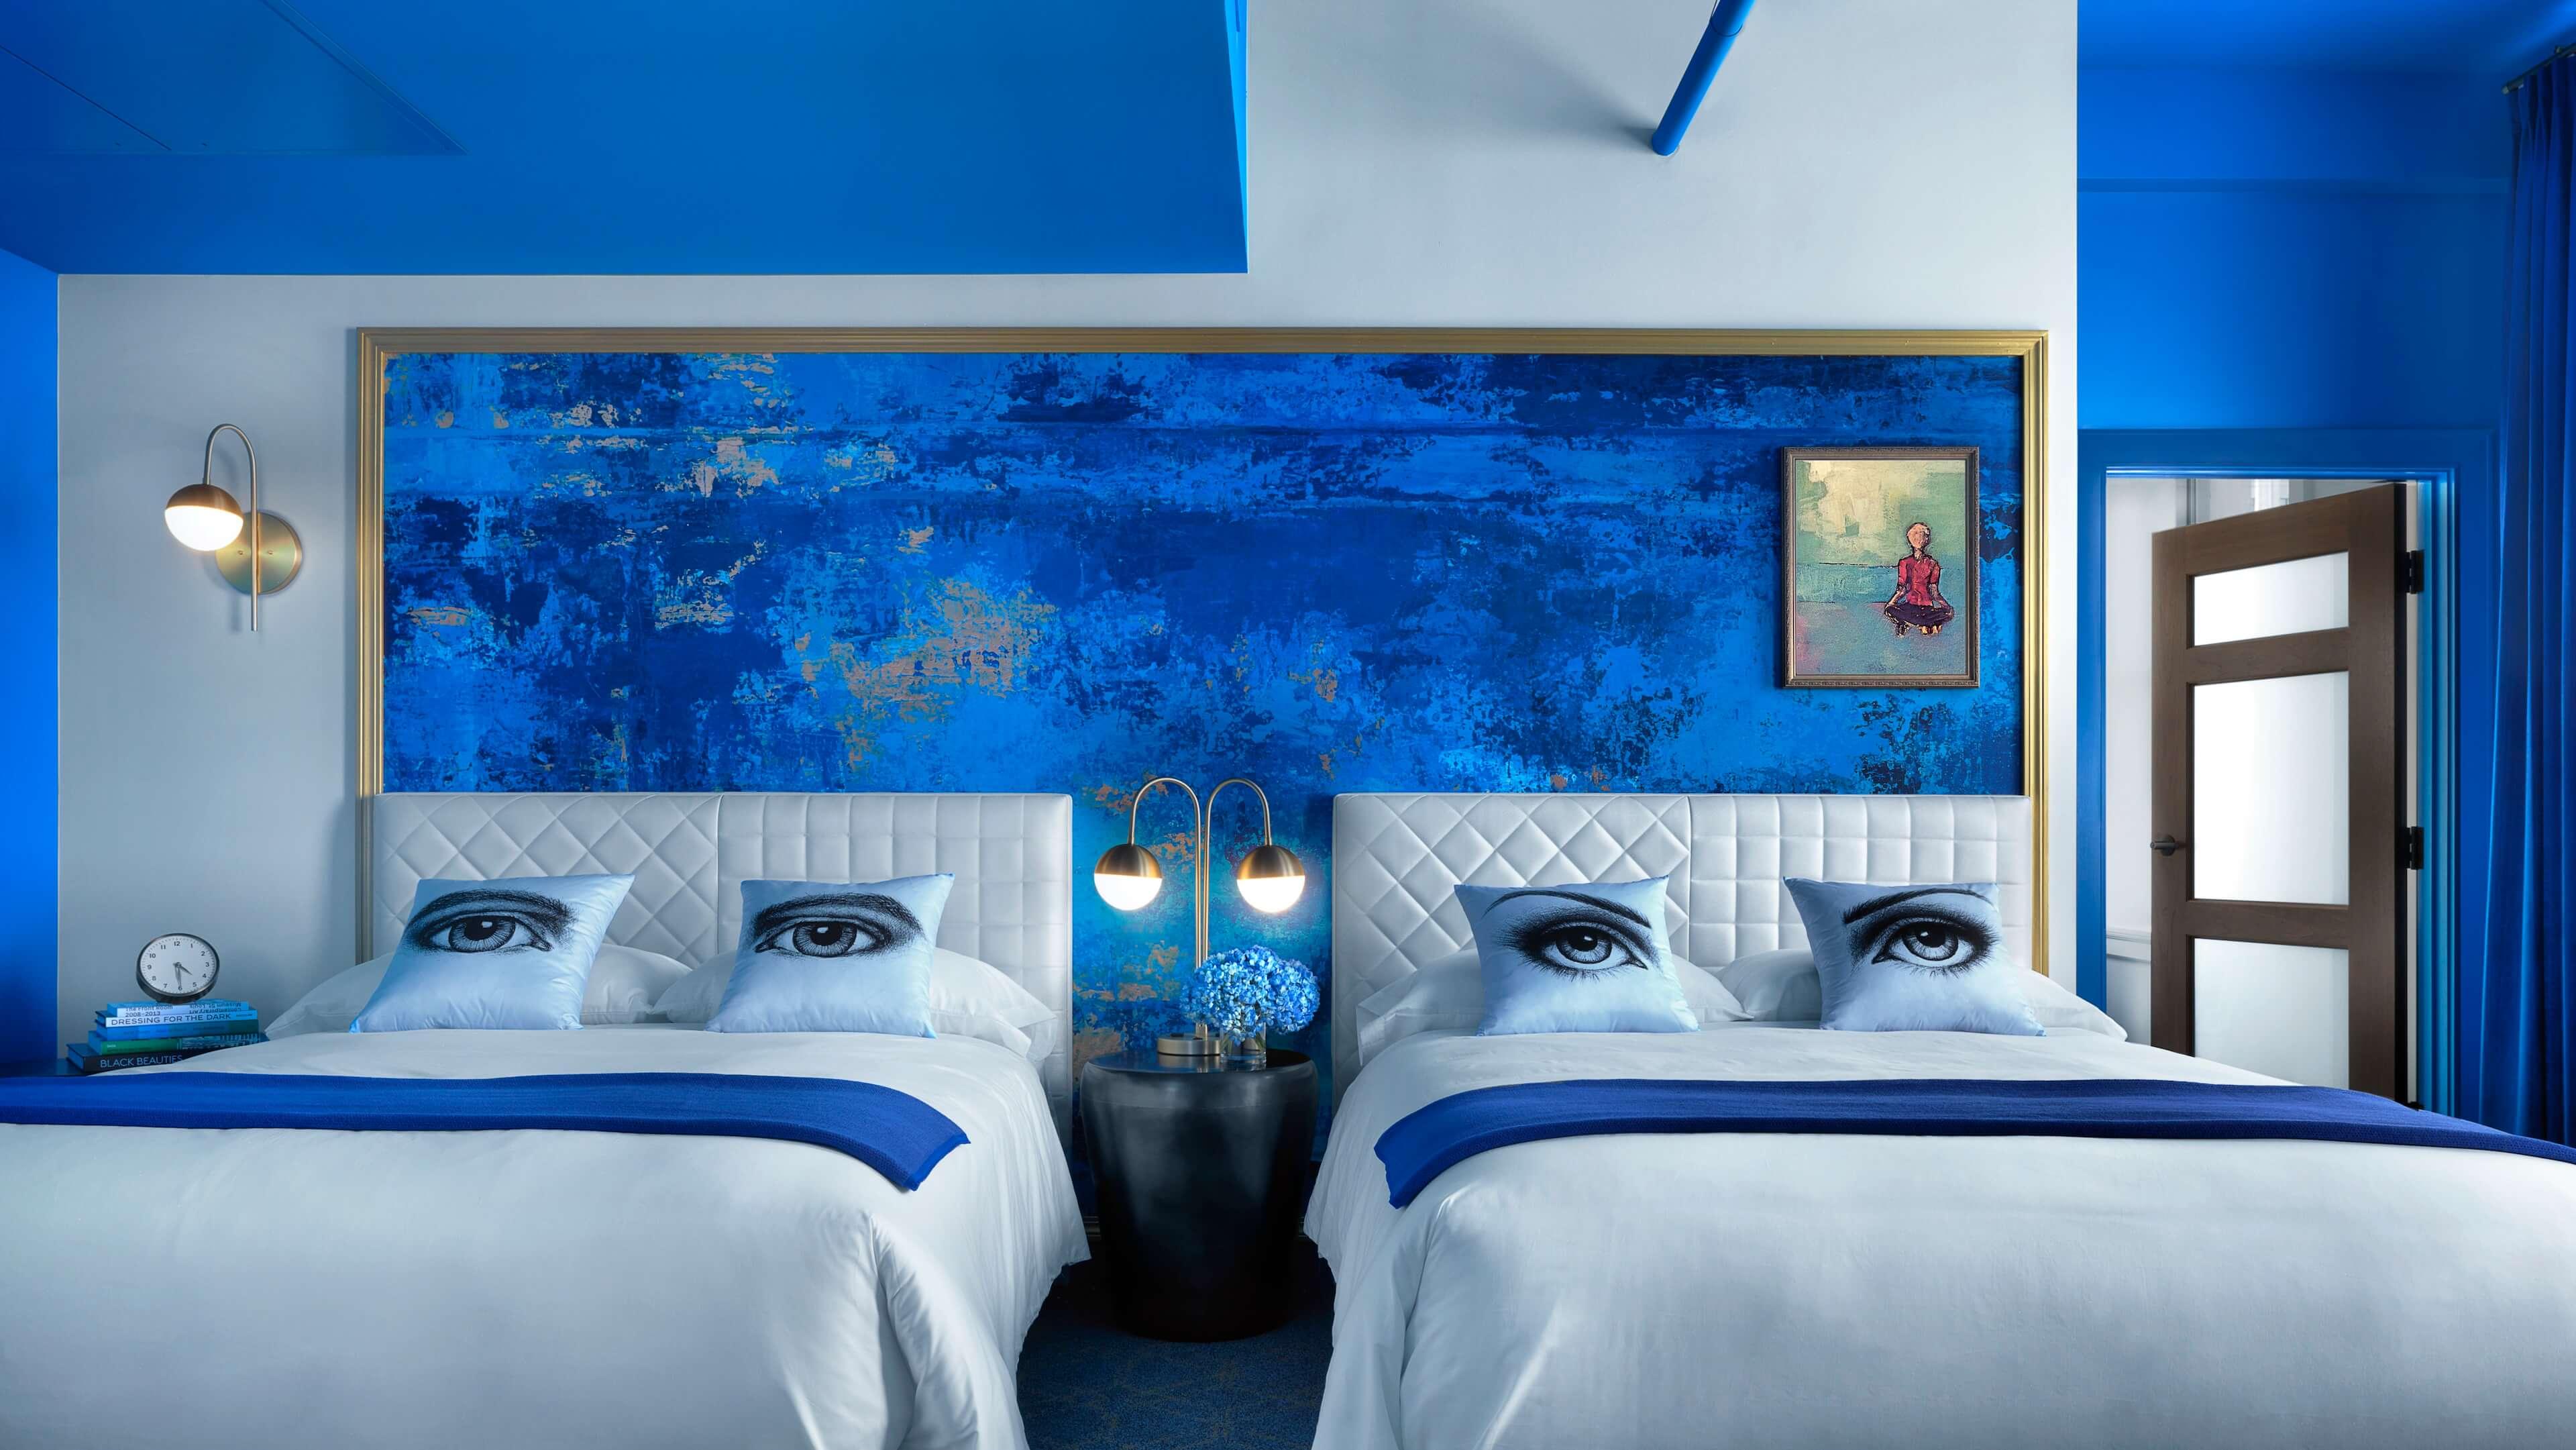 Amazon Queen Bleu can colour impact guest satisfaction? | click. magazine